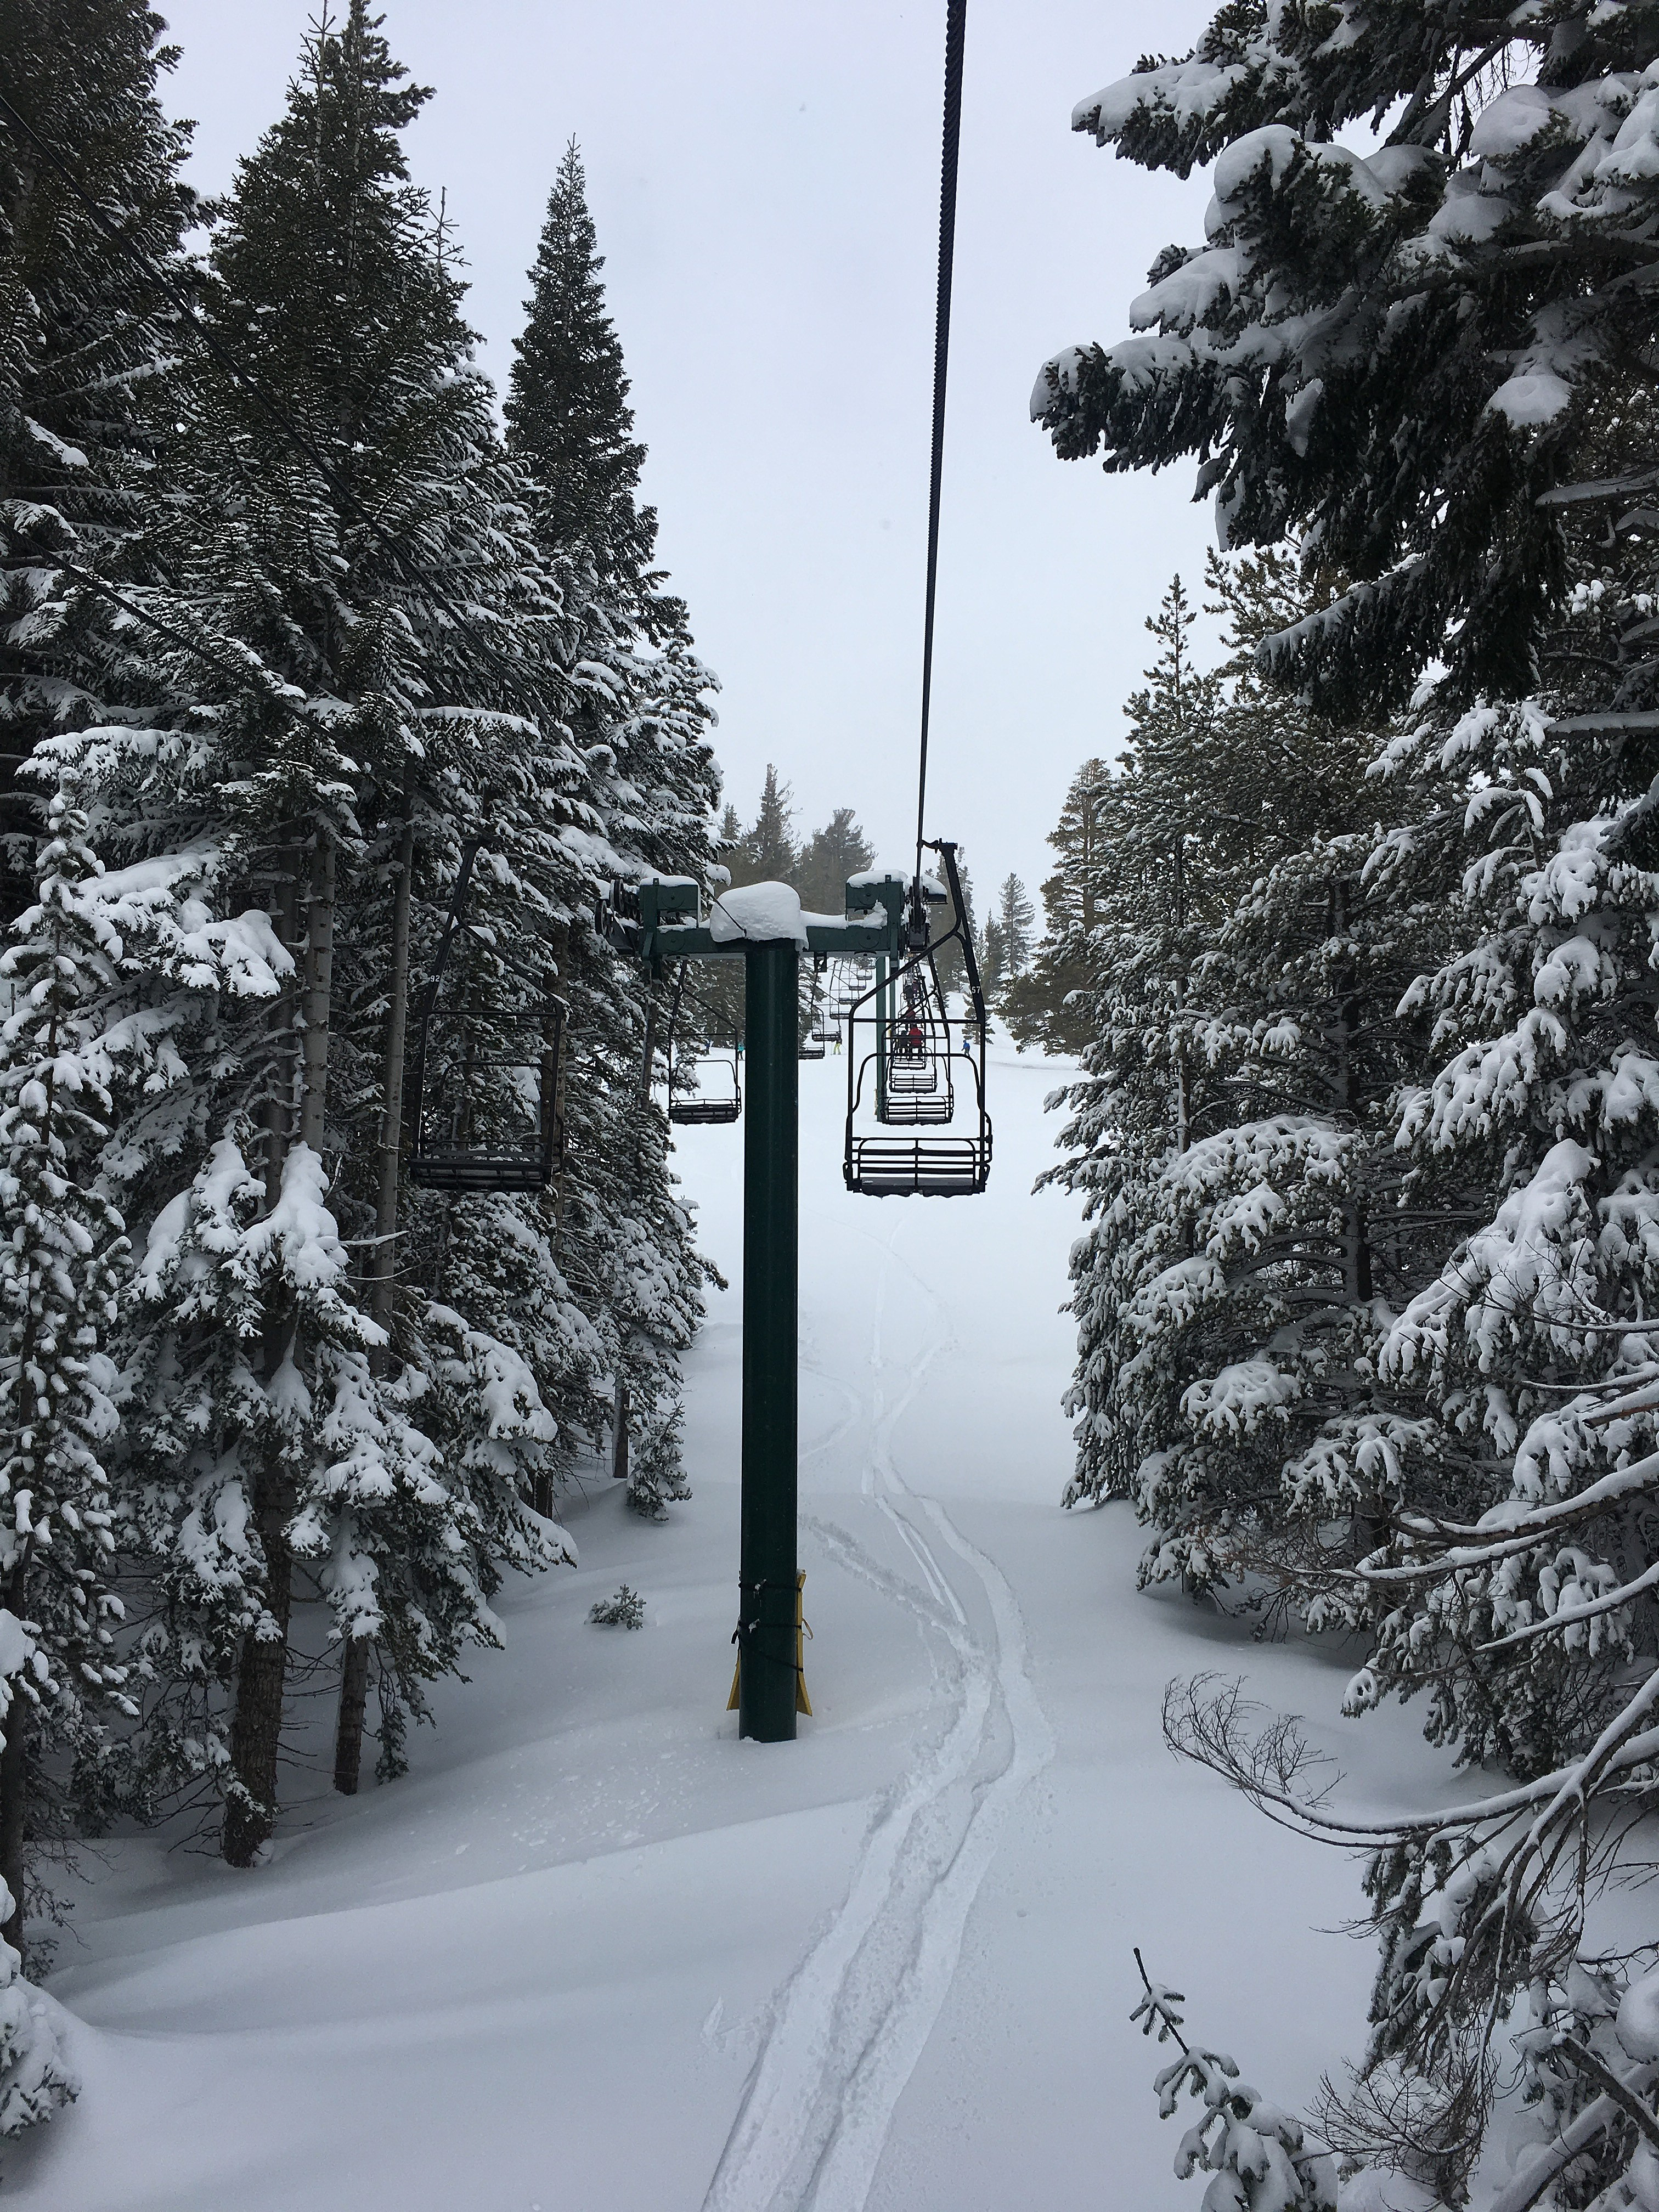 file:ski lift at kirkwood mountain resort - wikimedia commons